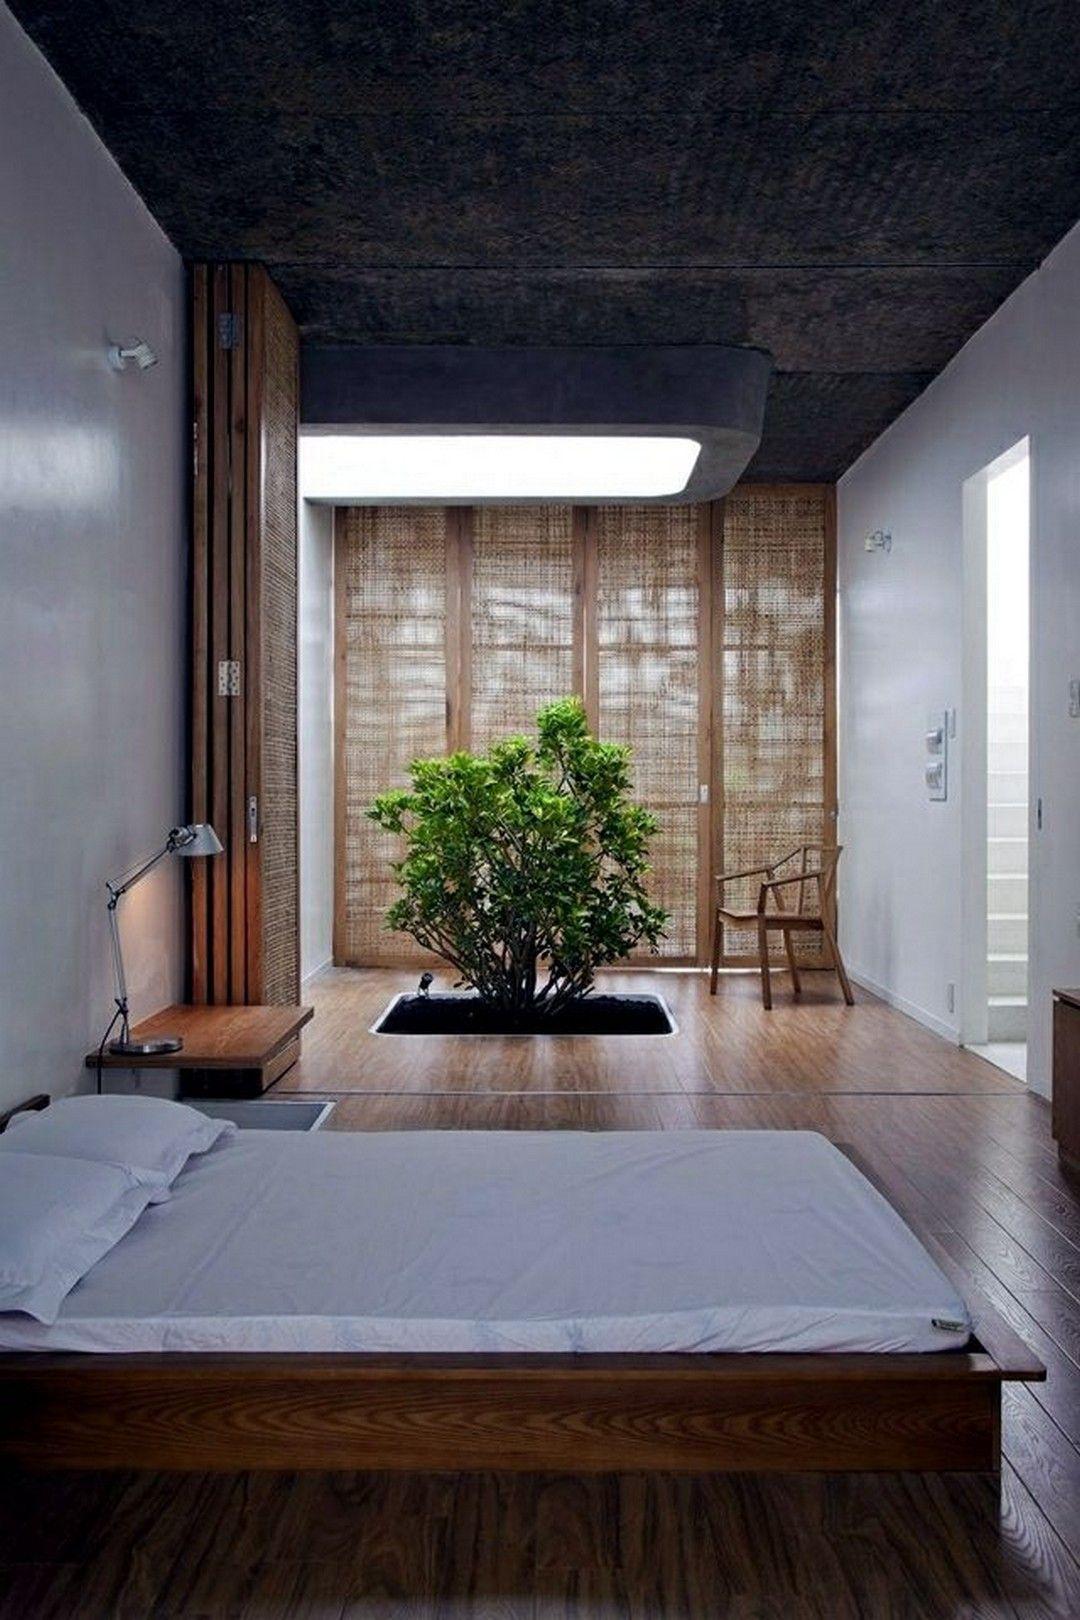 Interiordesignlivingroom Interiordesignconcept Interiordesignideen Interiordesignshop Interiorde Japanese Style Bedroom Zen Interiors Japanese Style House